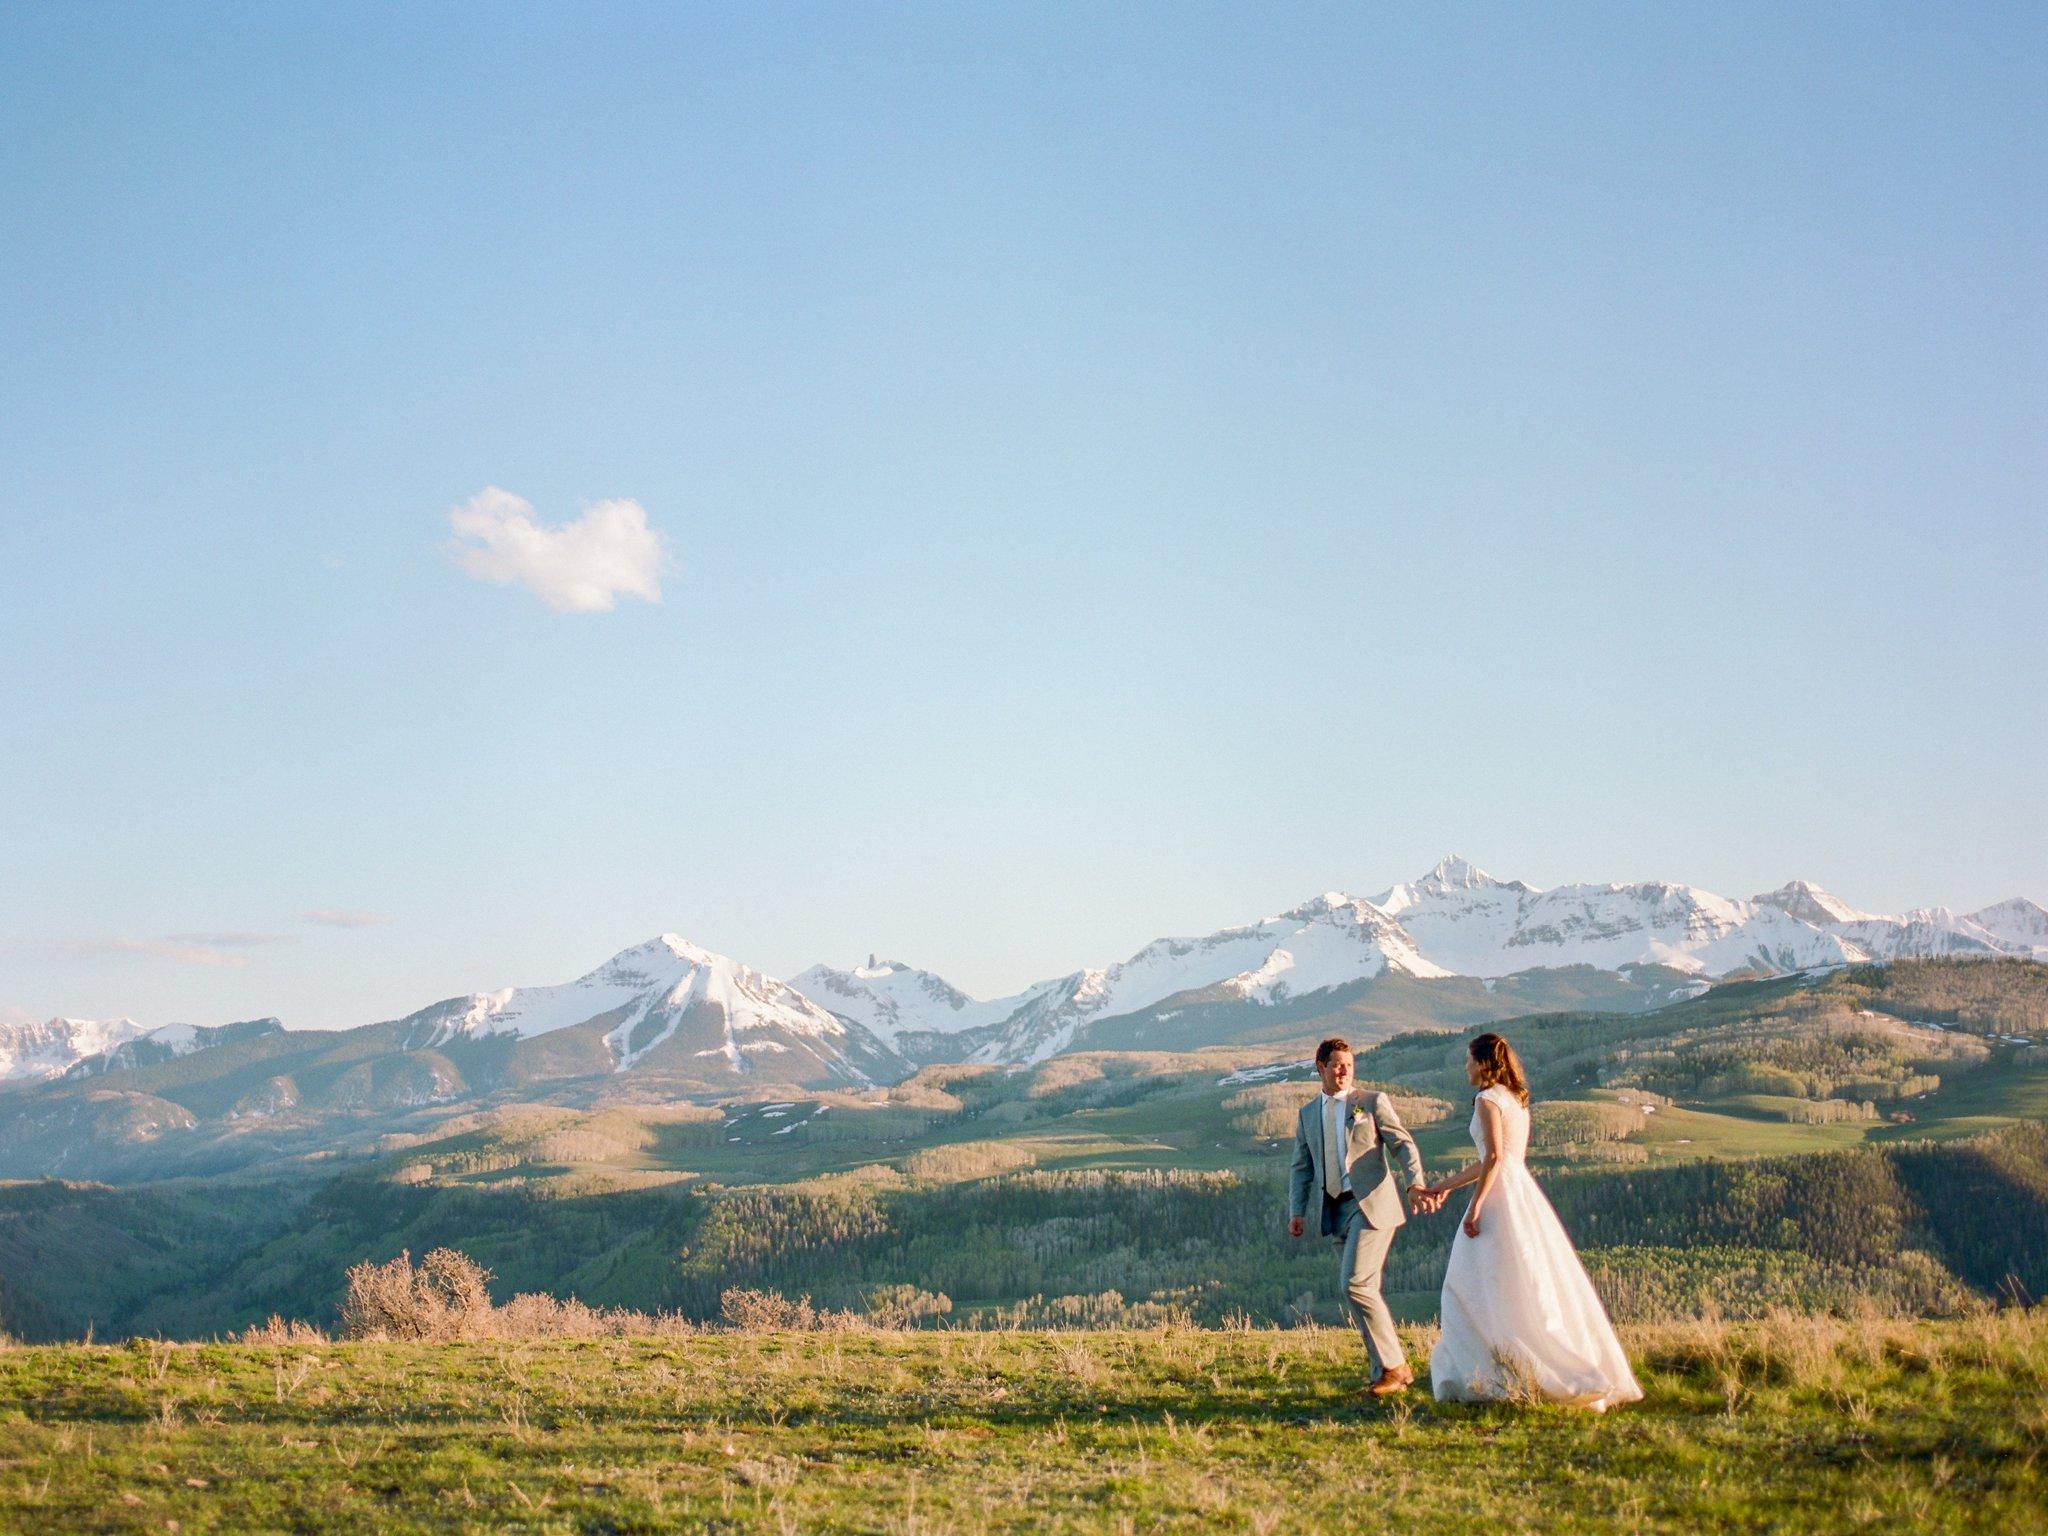 telluride wedding photographer colorado wedding photographer shannon griffin photography_0007.jpg